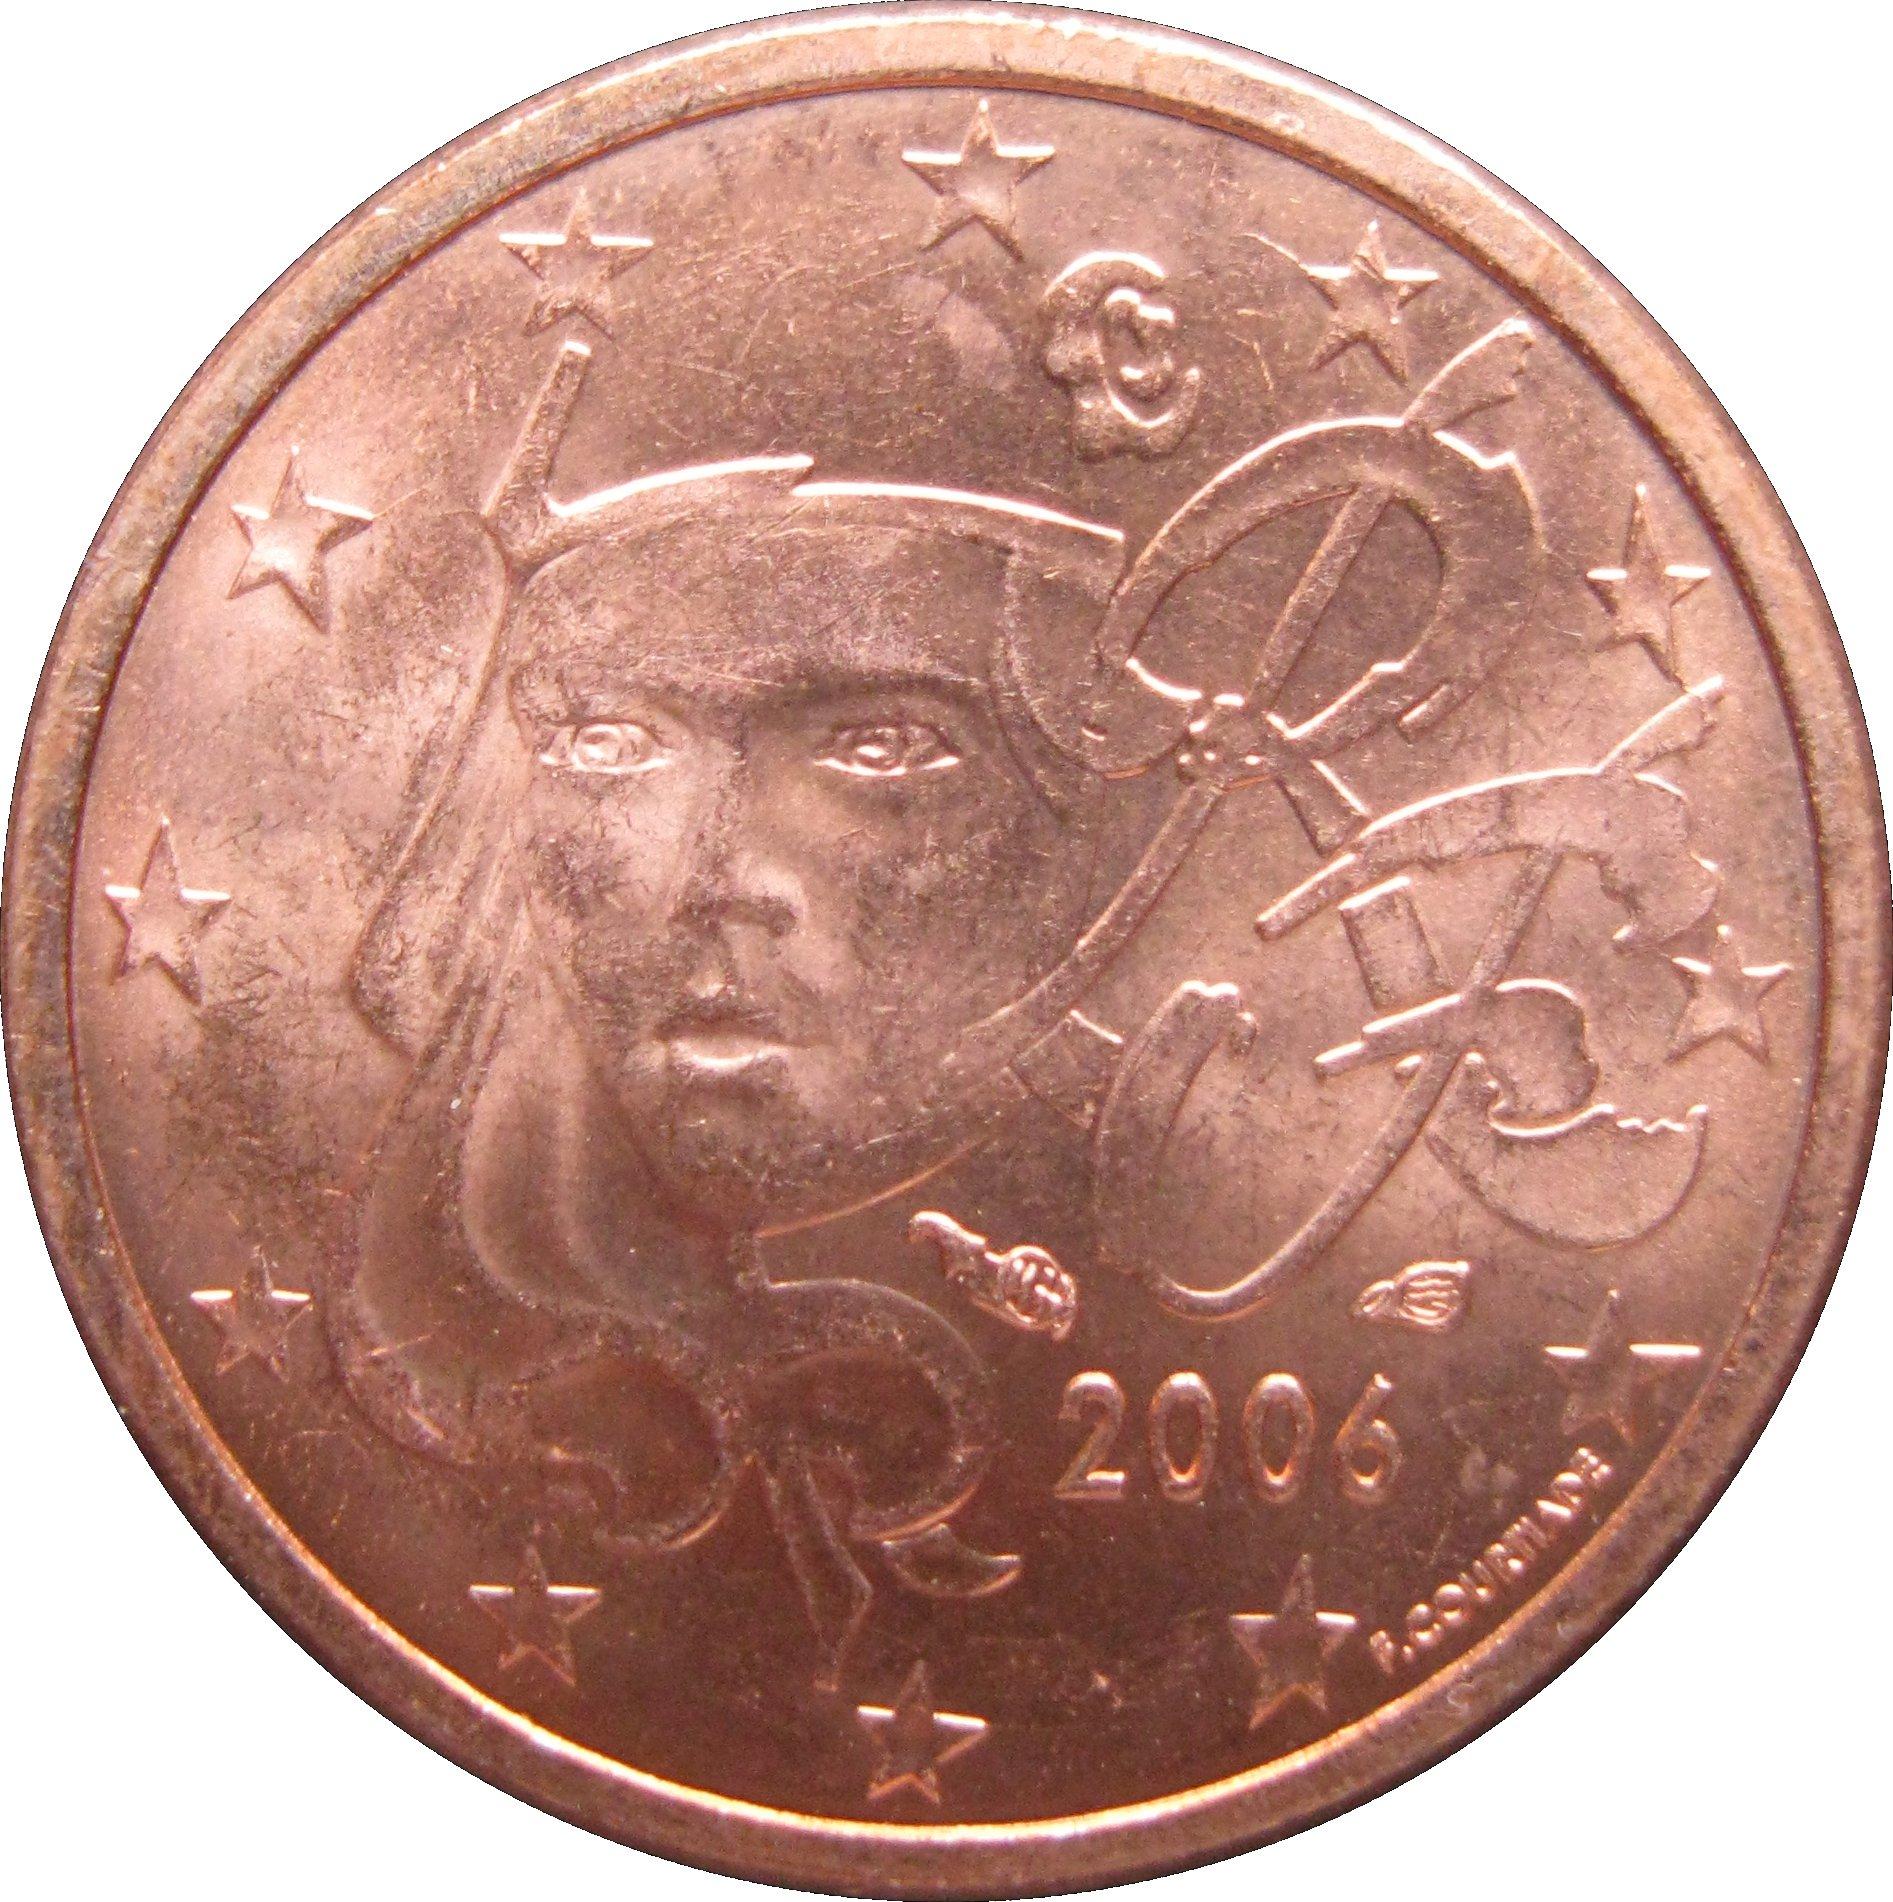 2 euro cent 2014 цена национальная валюта кубы сканворд